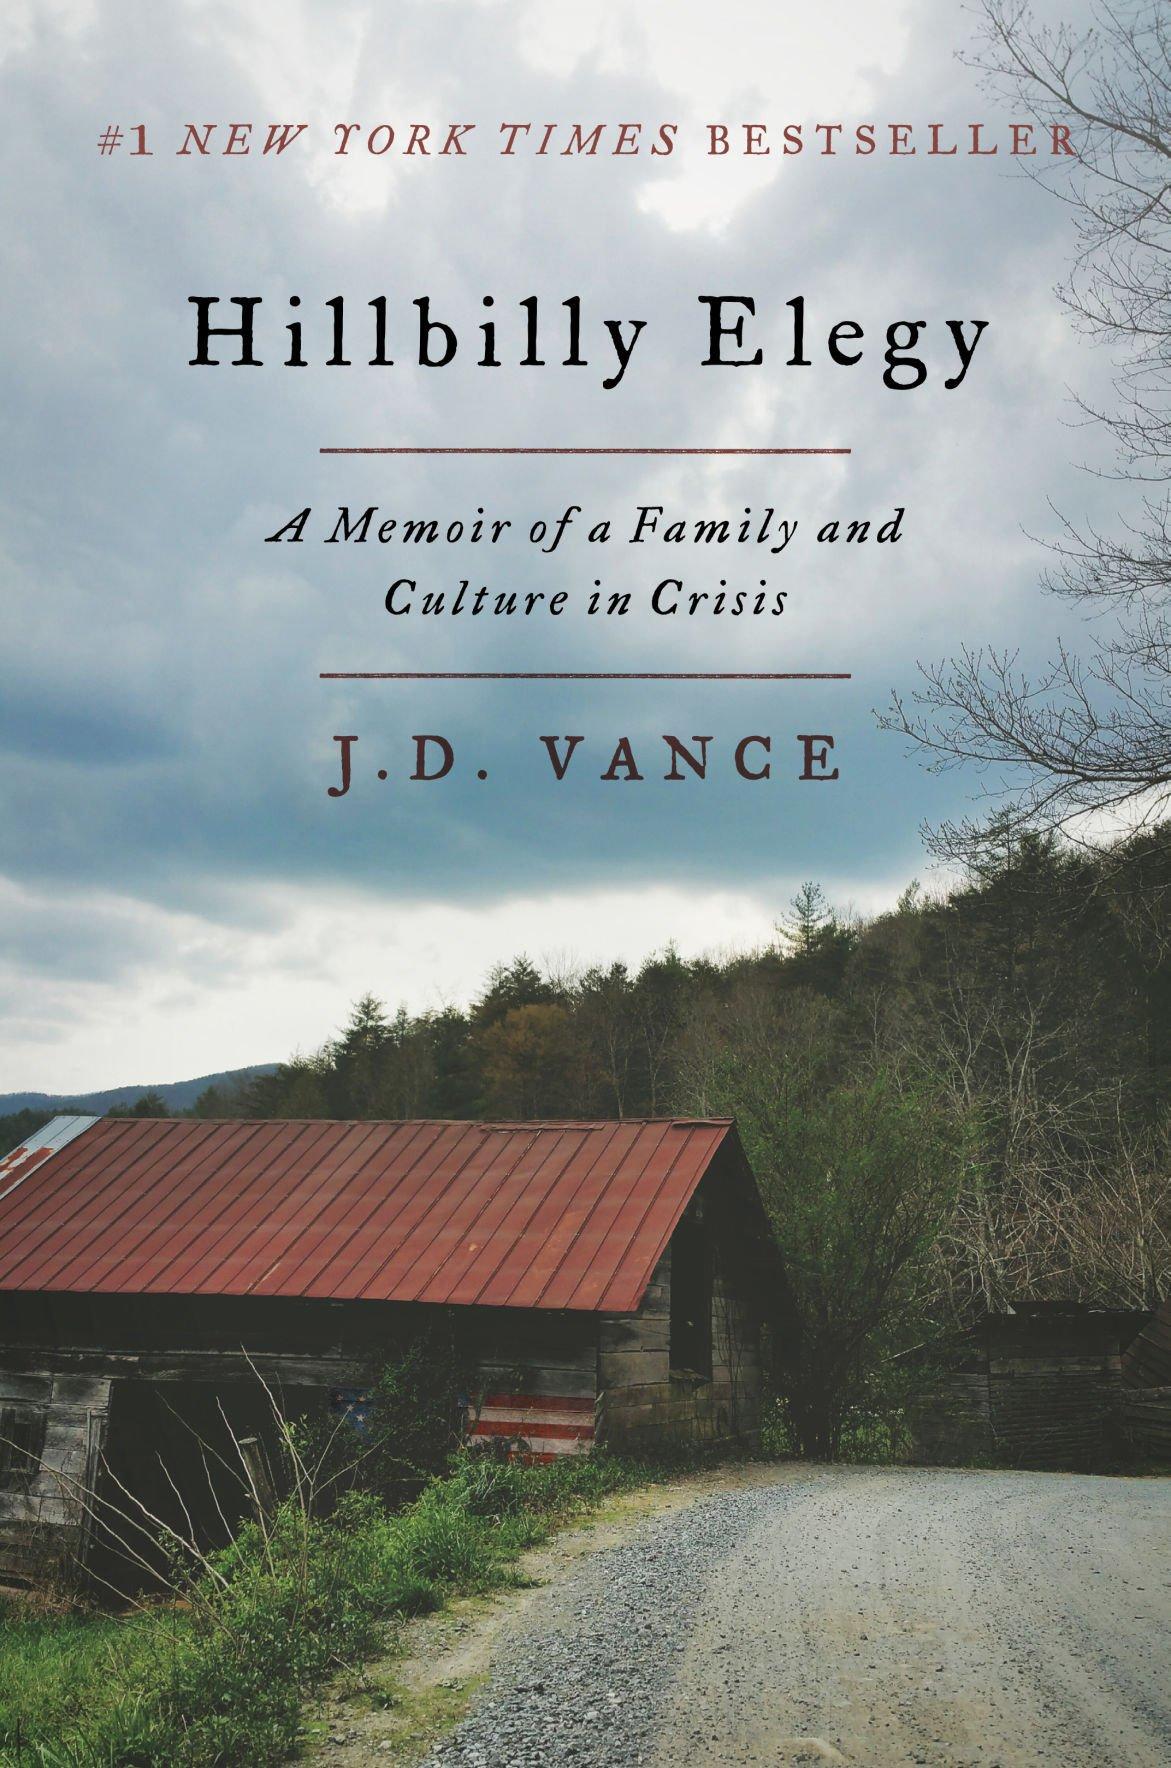 'Hillbilly Elegy'